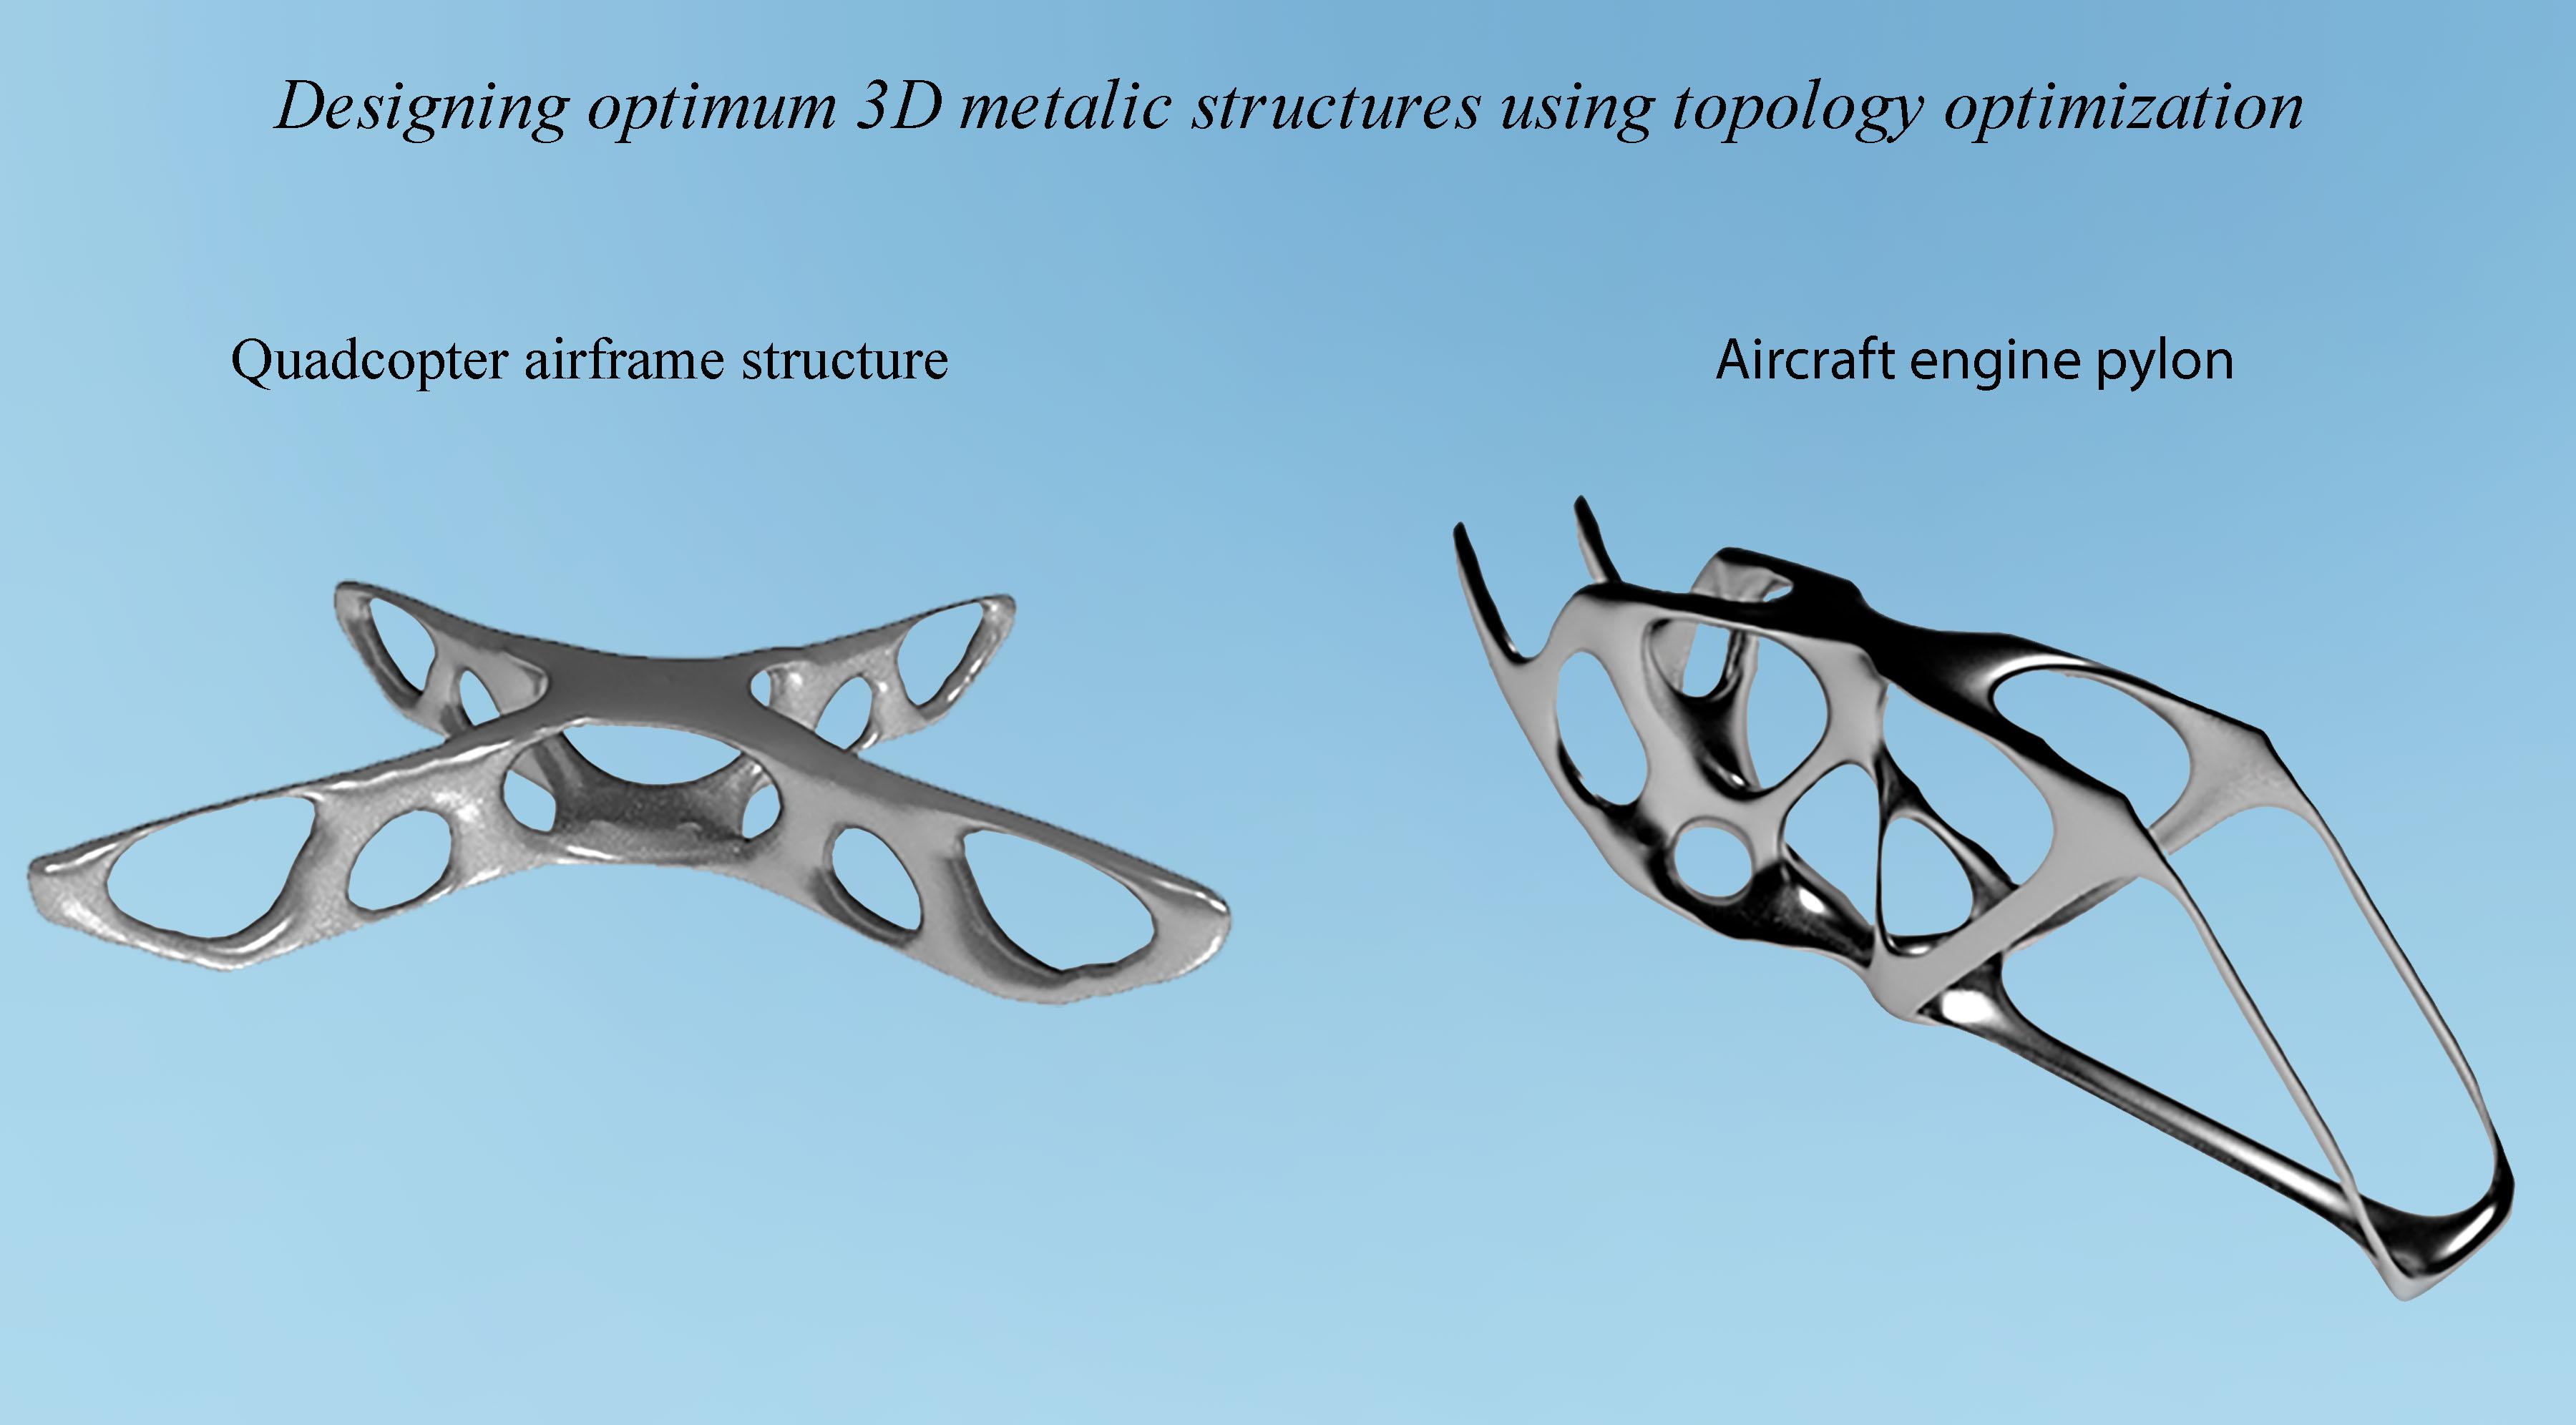 25 - Designing optimum 3D metalic structures using topology optimization